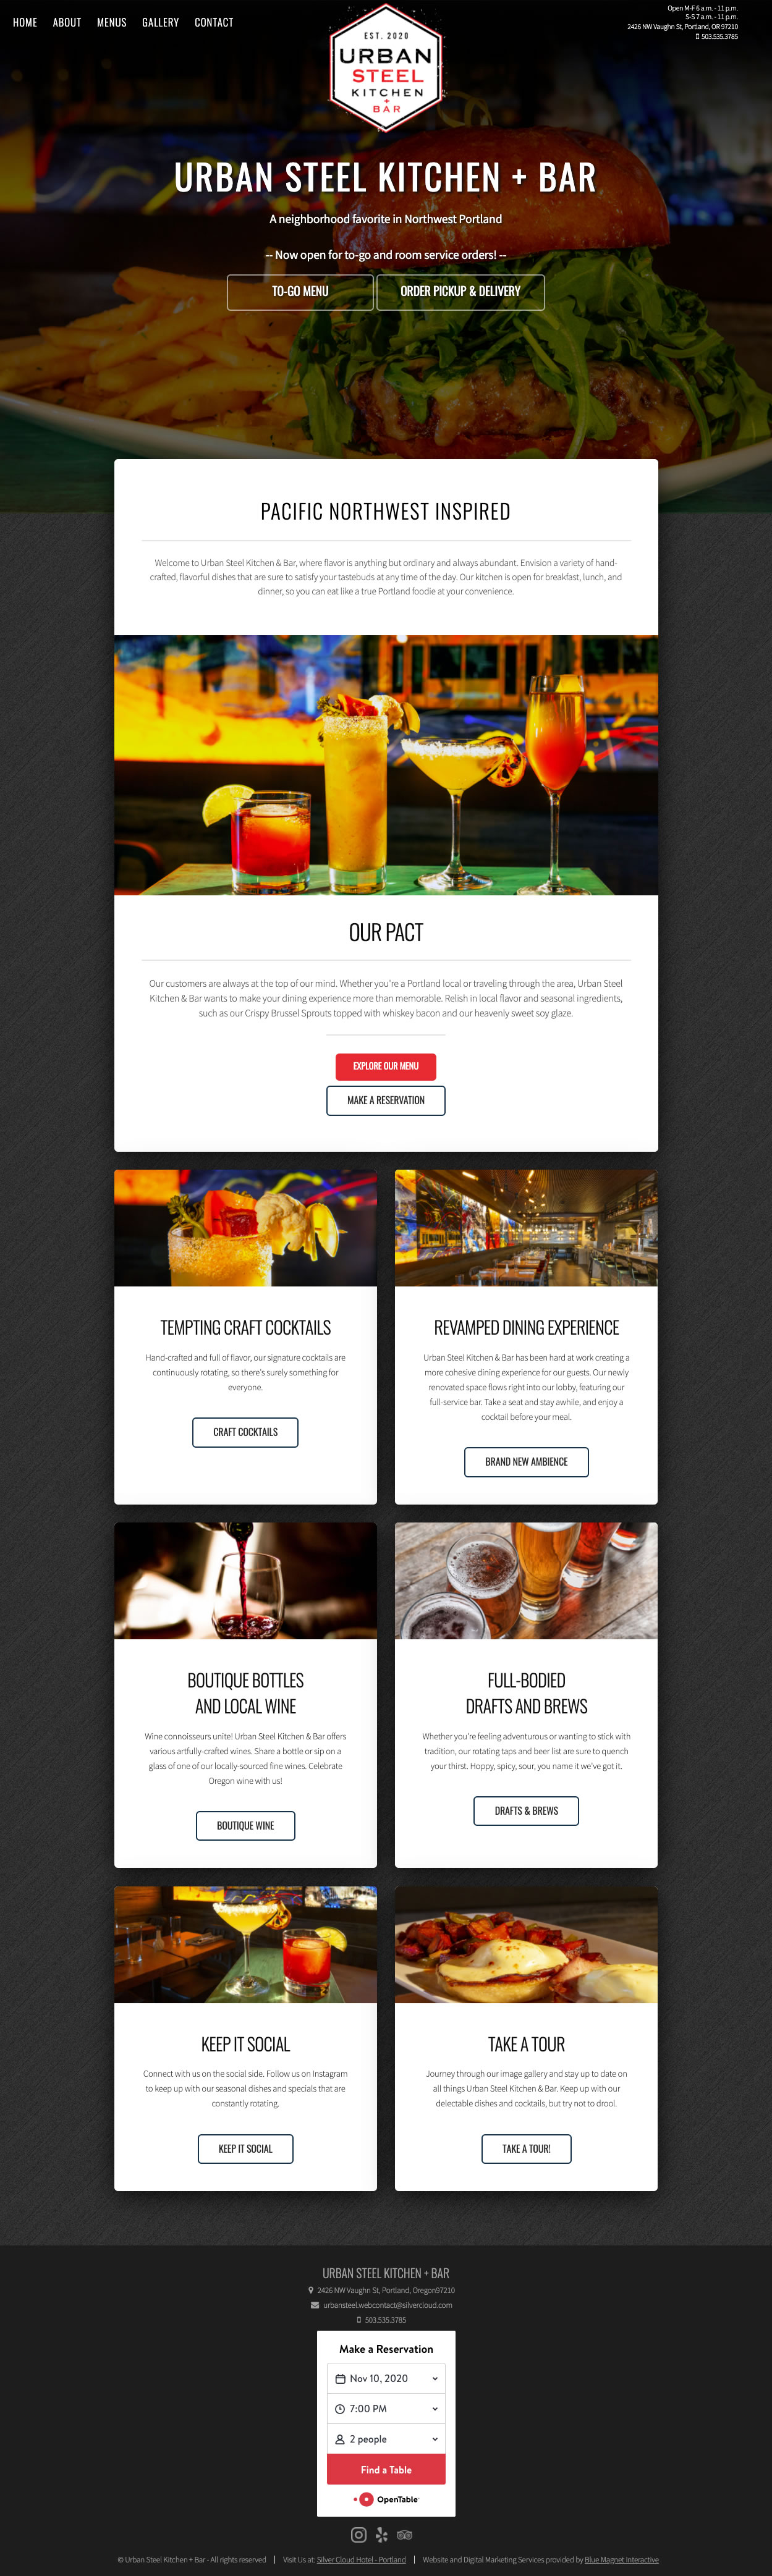 web design example urban steel kitchen